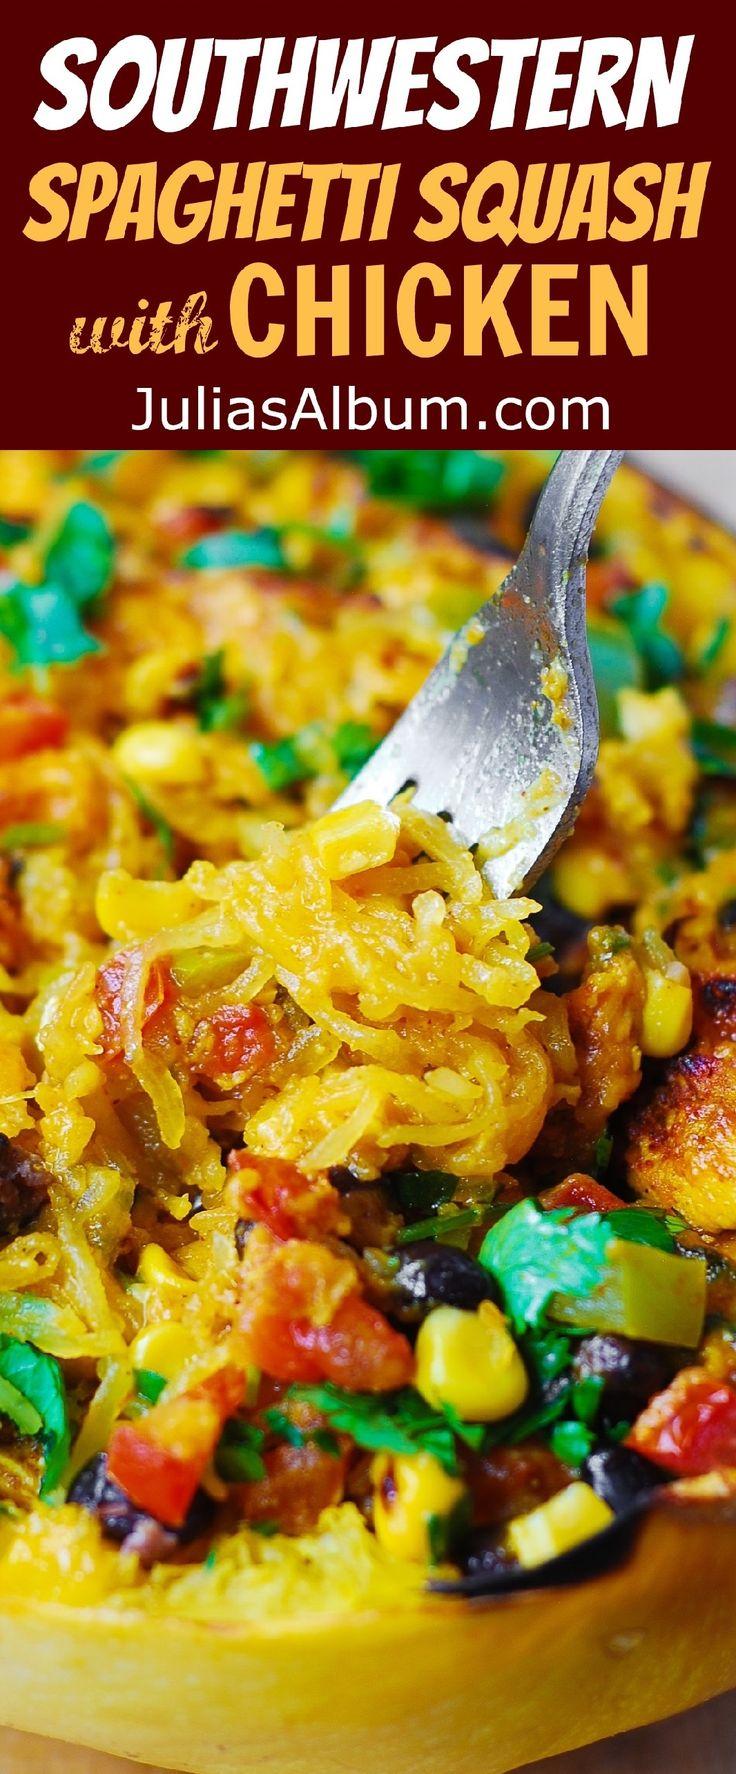 Southwestern Chicken Stuffed Spaghetti Squash - perfect Autumn dinner!  (Thanksgiving, holidays recipes)